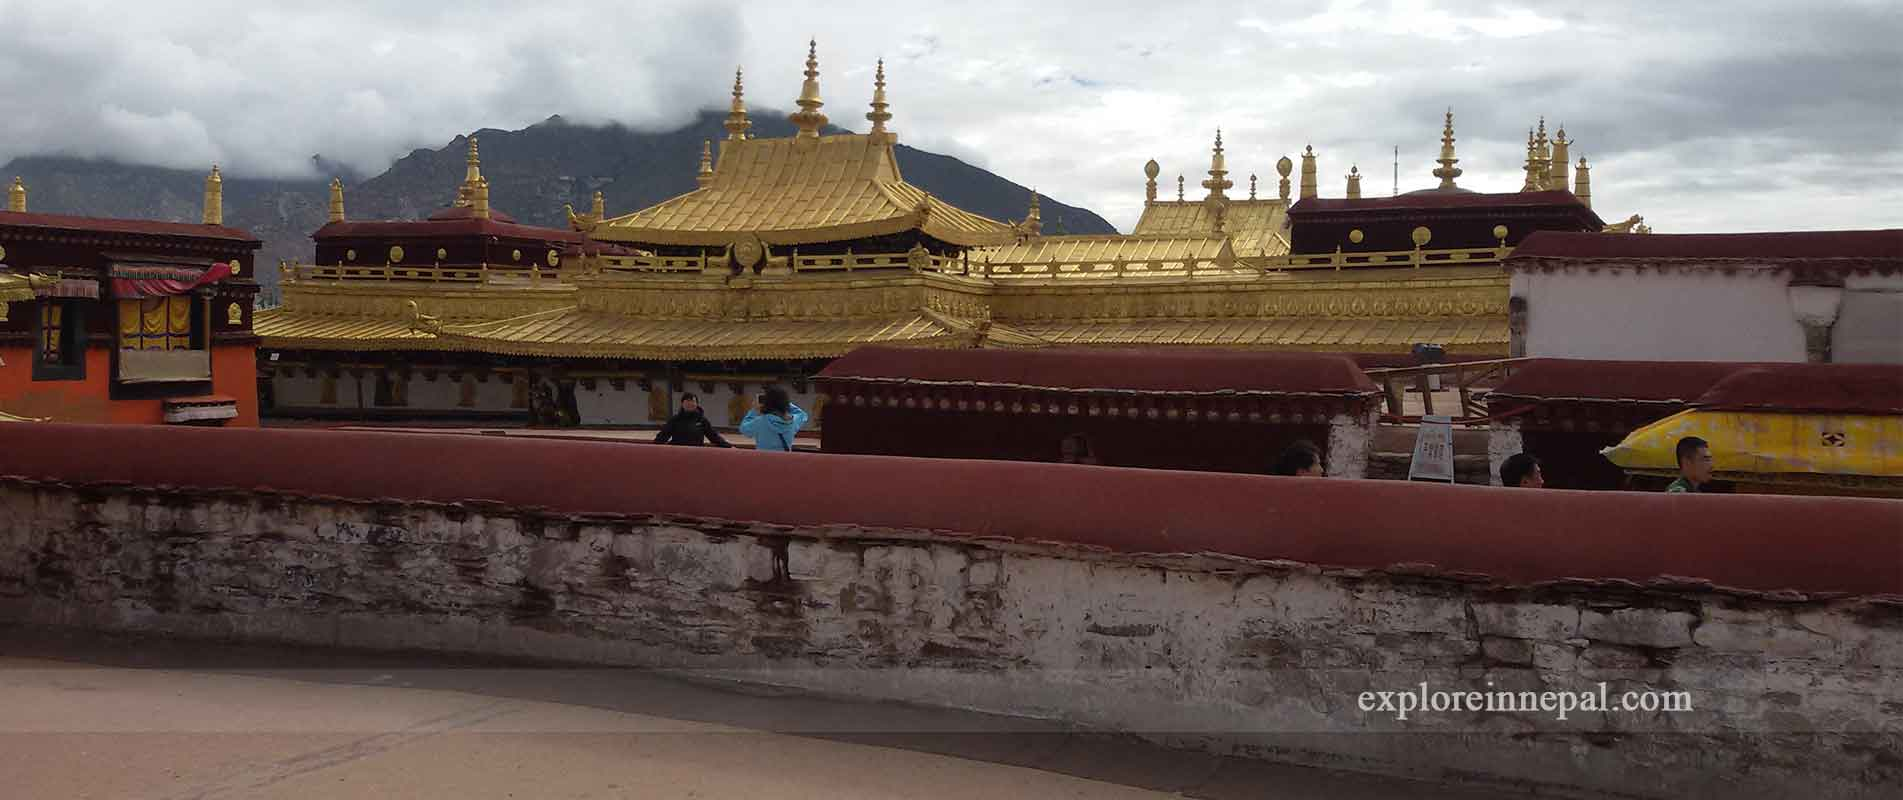 tibet-cultural-tour-view